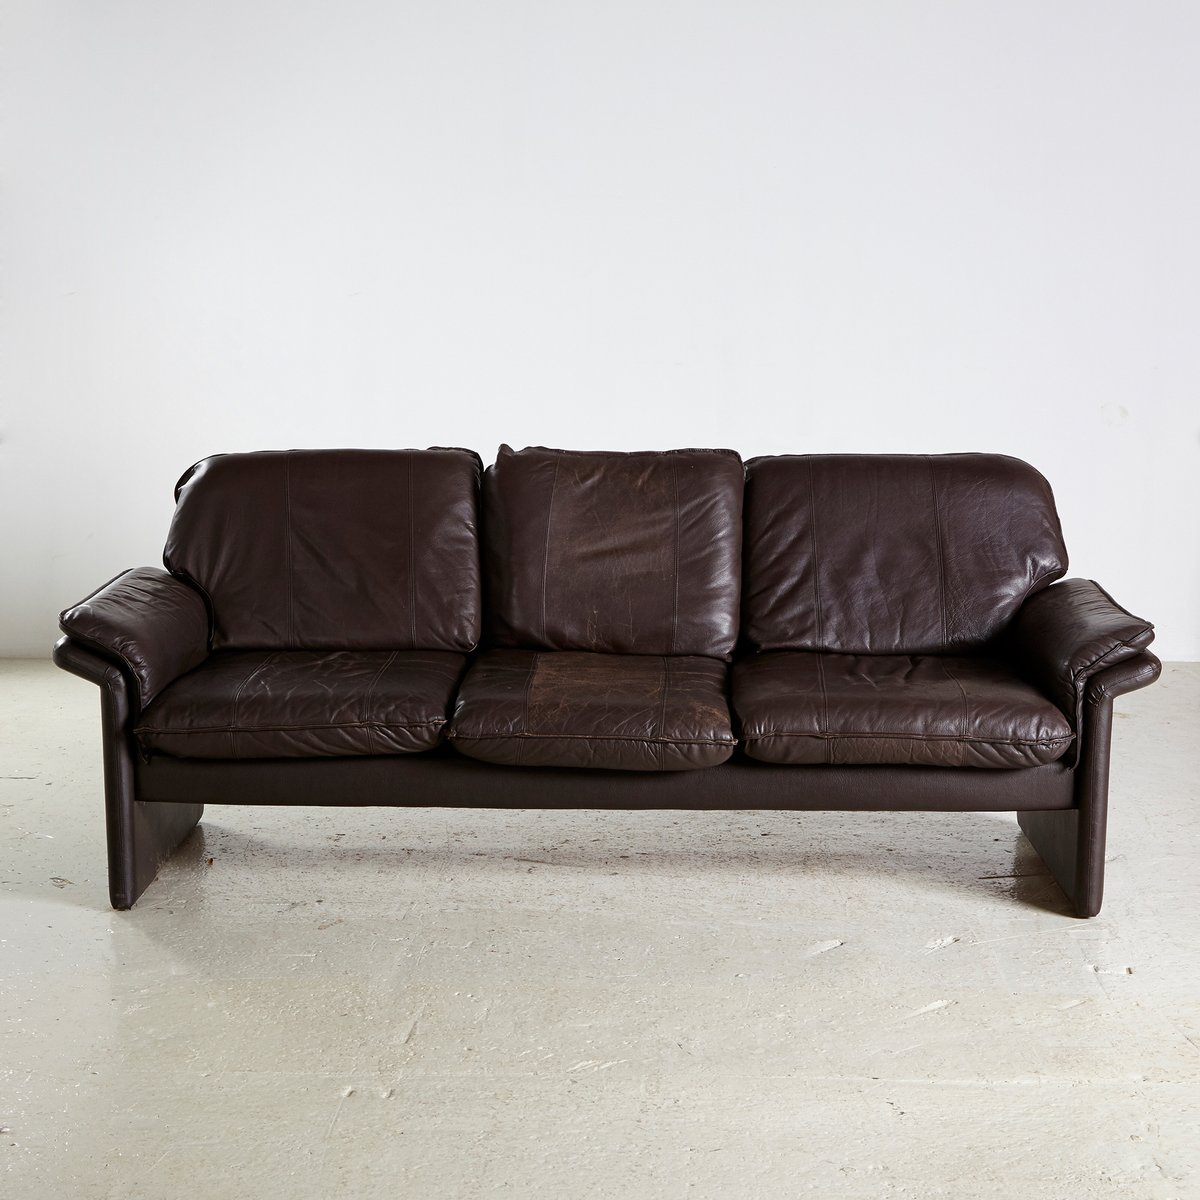 Dunkelbraunes Vintage 3-Sitzer Sofa, 1960er